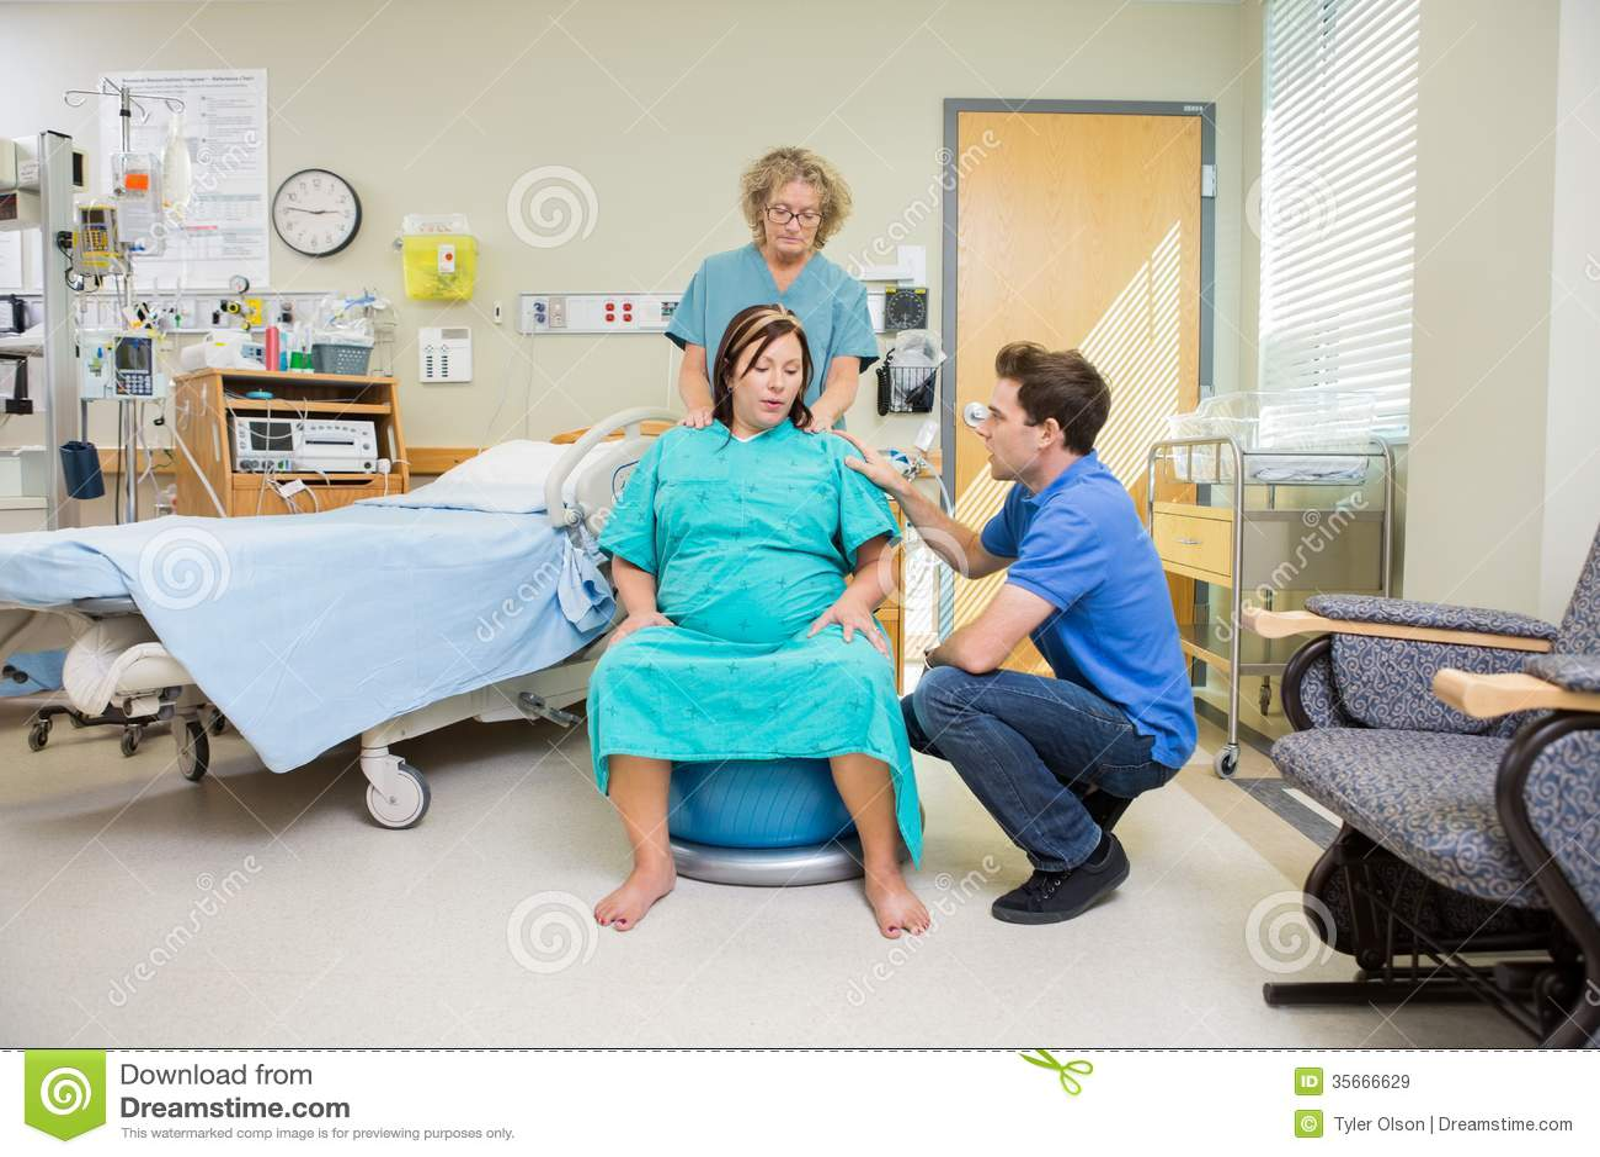 newborn nurse